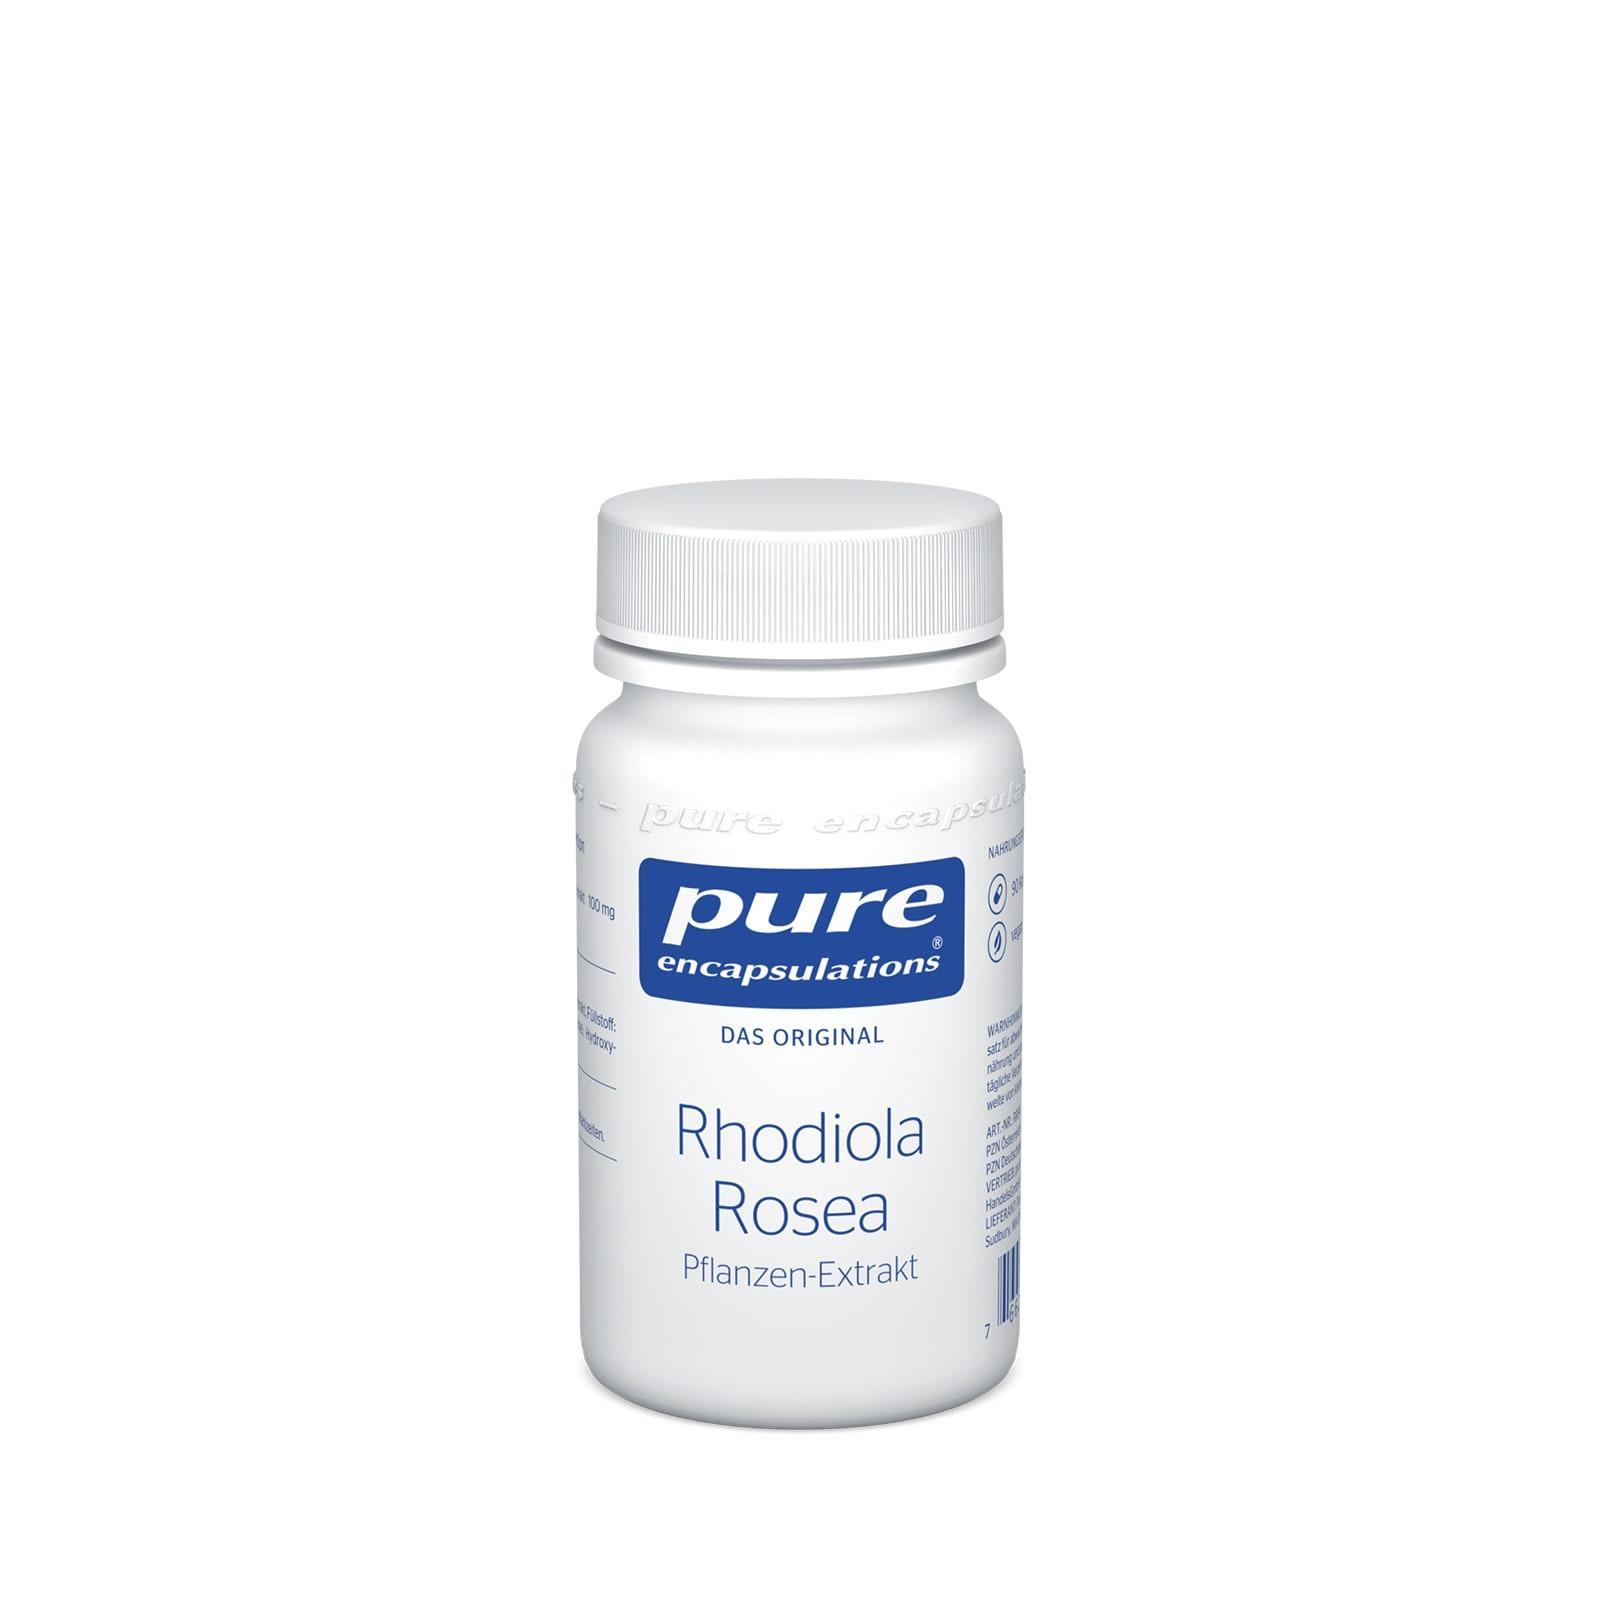 Pure Encapsulations Rhodiola Rosea